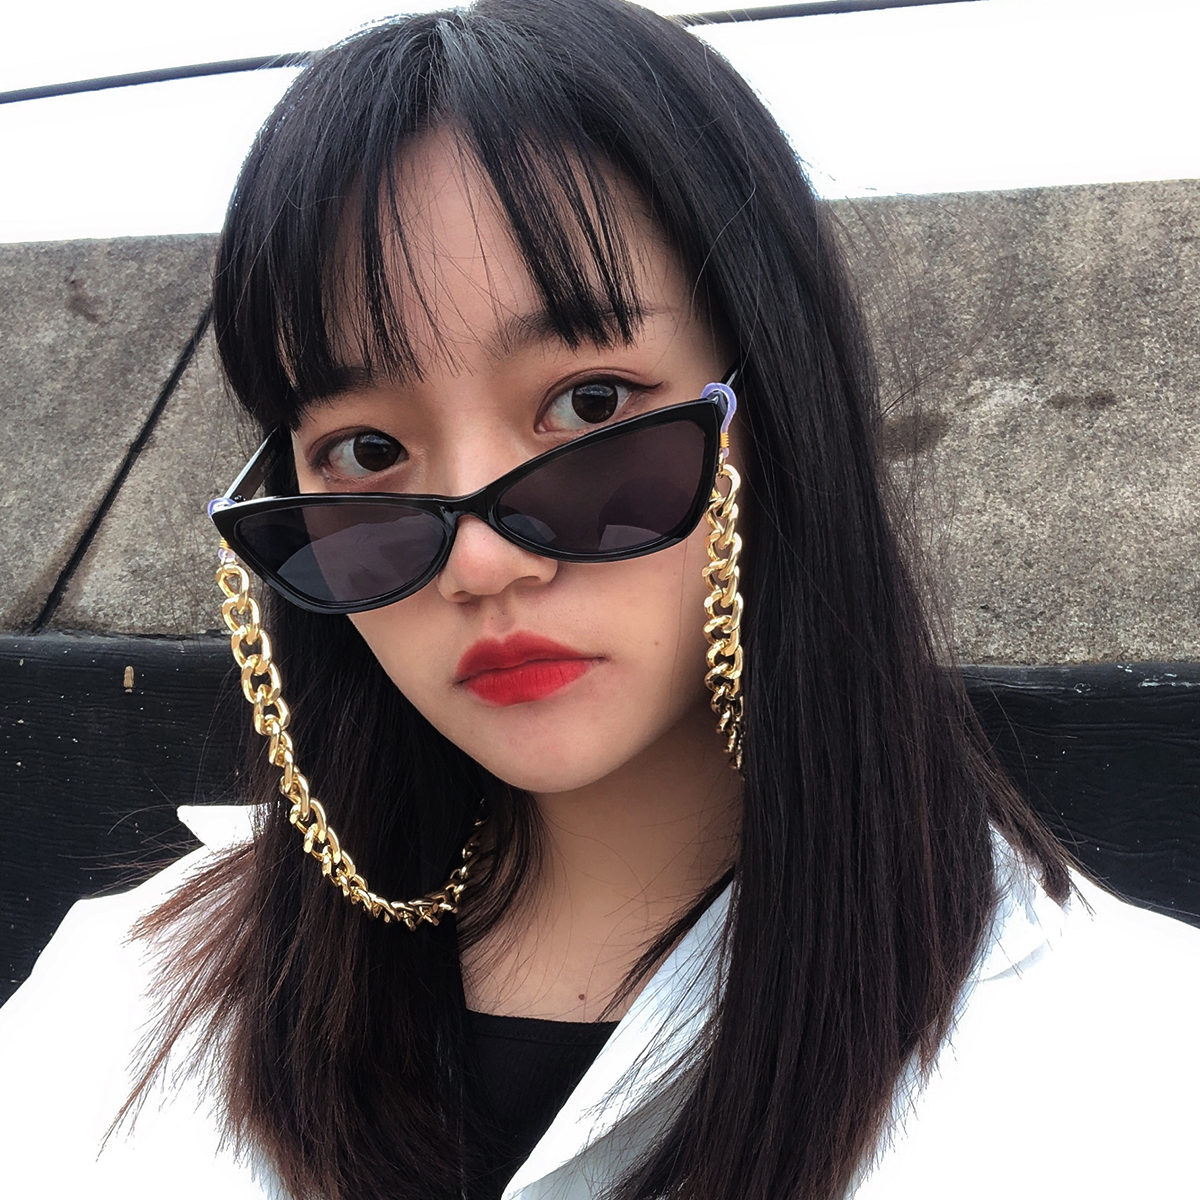 Steampunk Reading Glasses Aluminum Sunglasses Chain Holder Cord Lanyard Metal Neck Strap Lanyard Eyewears Glasses Accessories